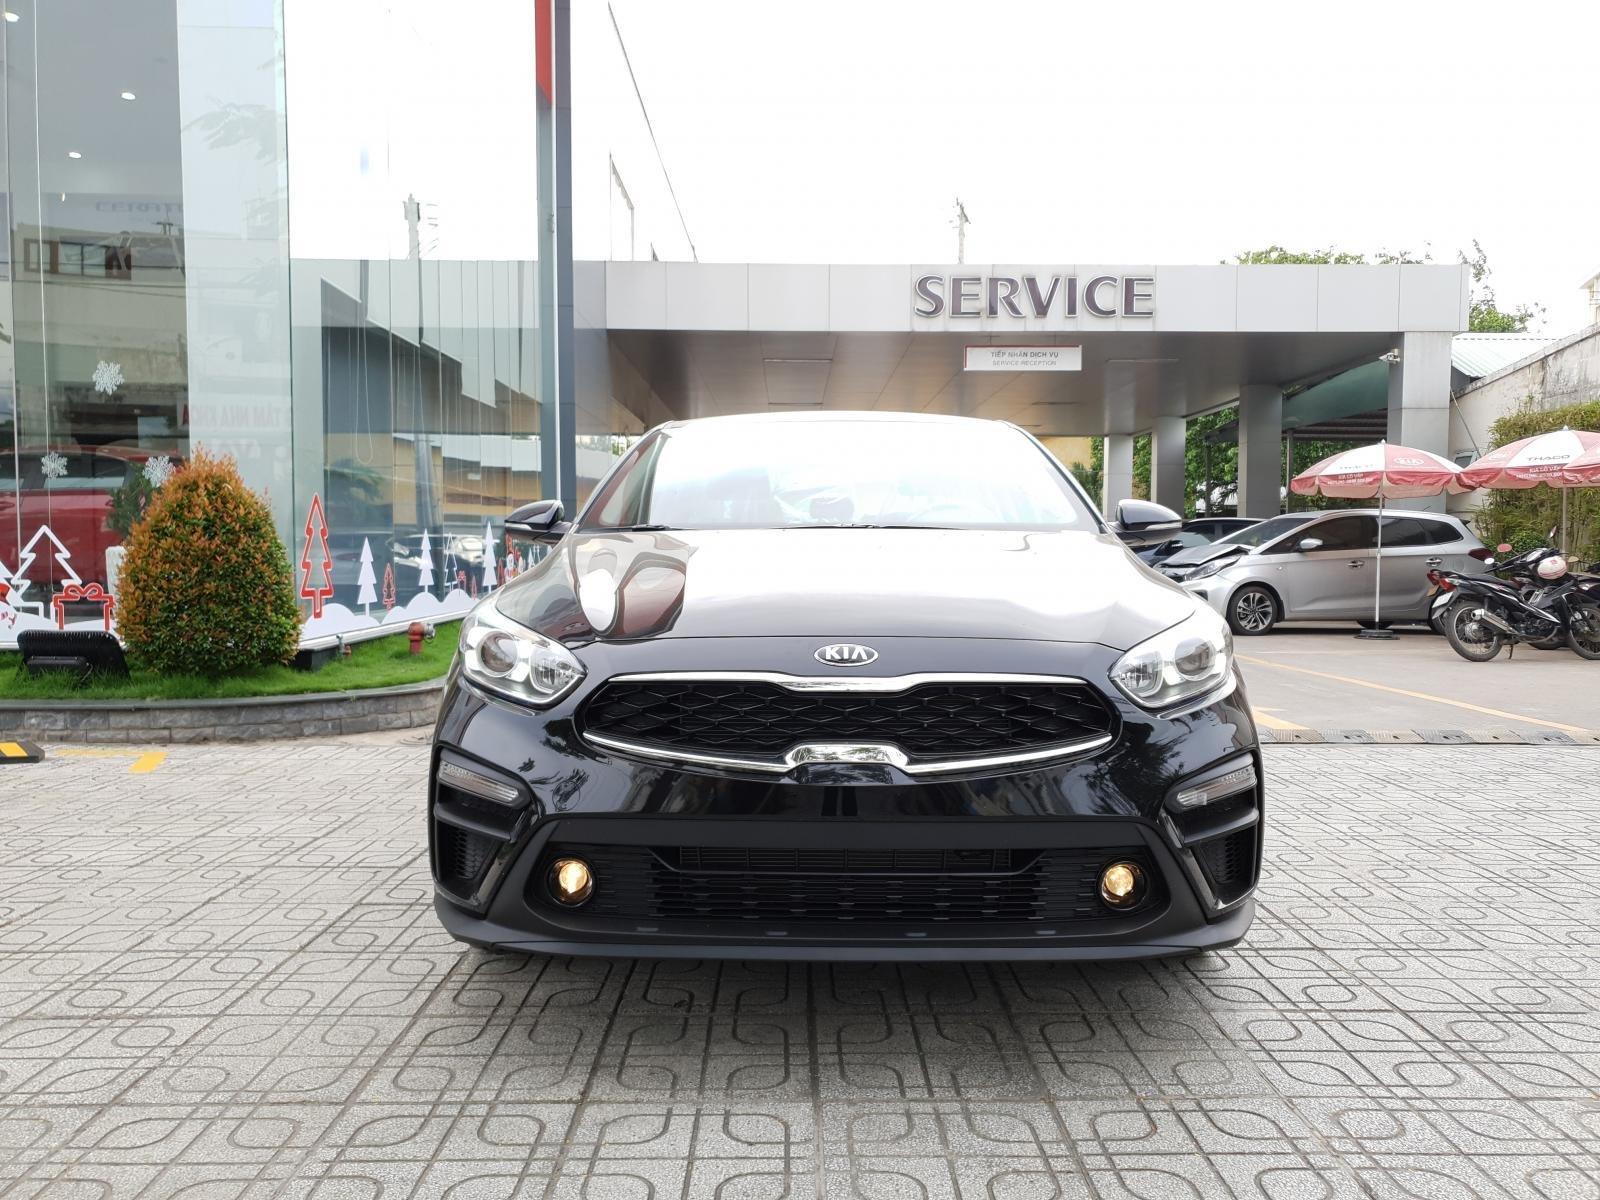 Cần bán Kia Cerato Deluxe năm sản xuất 2019, màu đen-0